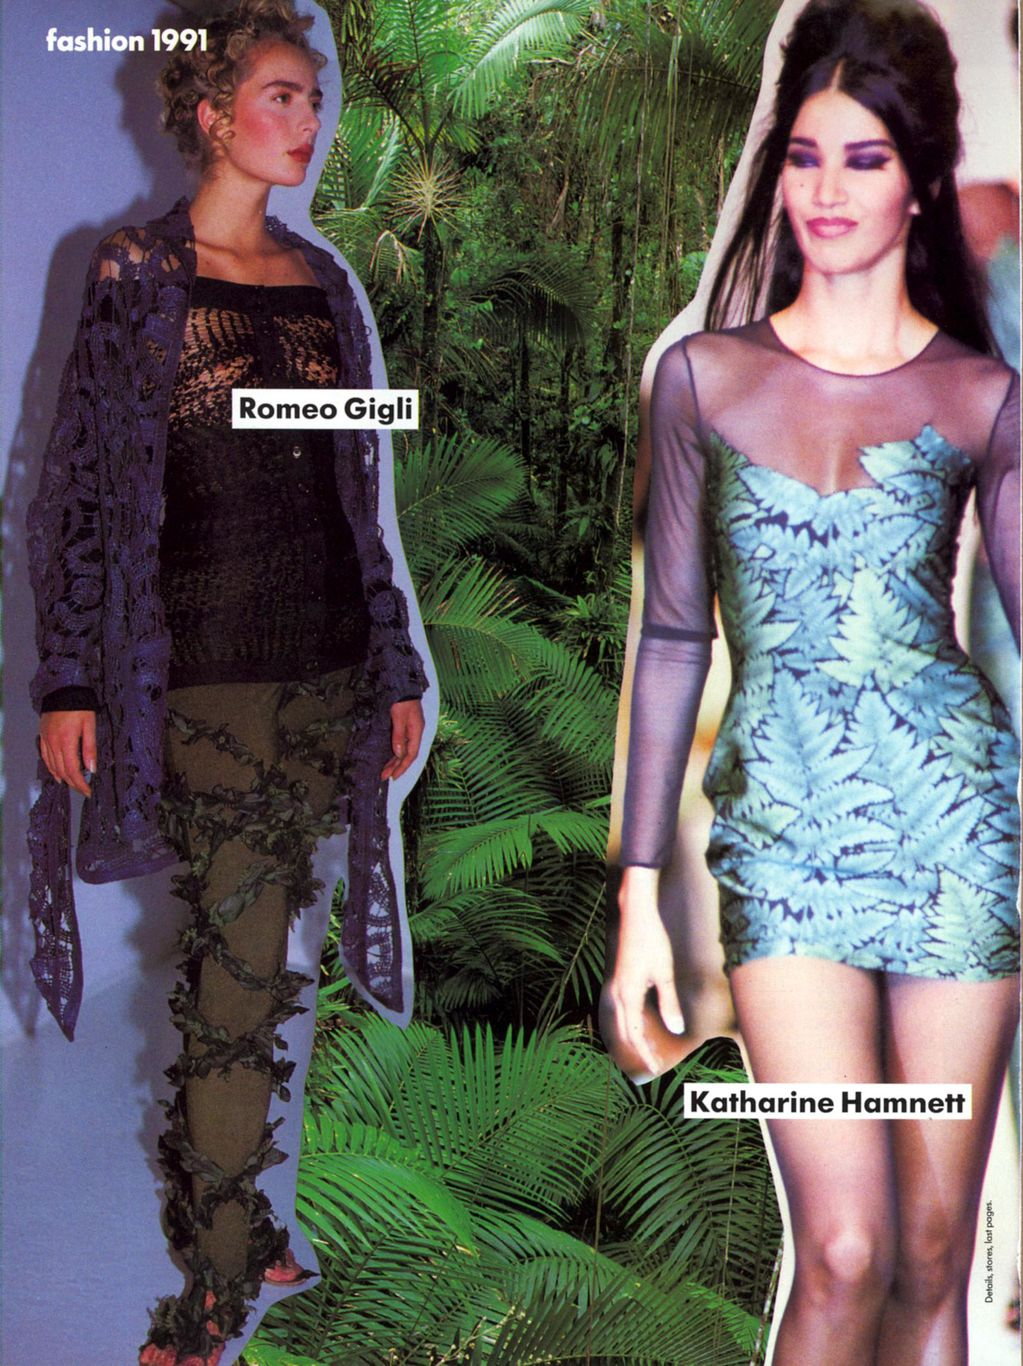 Vogue (US) January 1991 | Fashion 1991 09.jpg